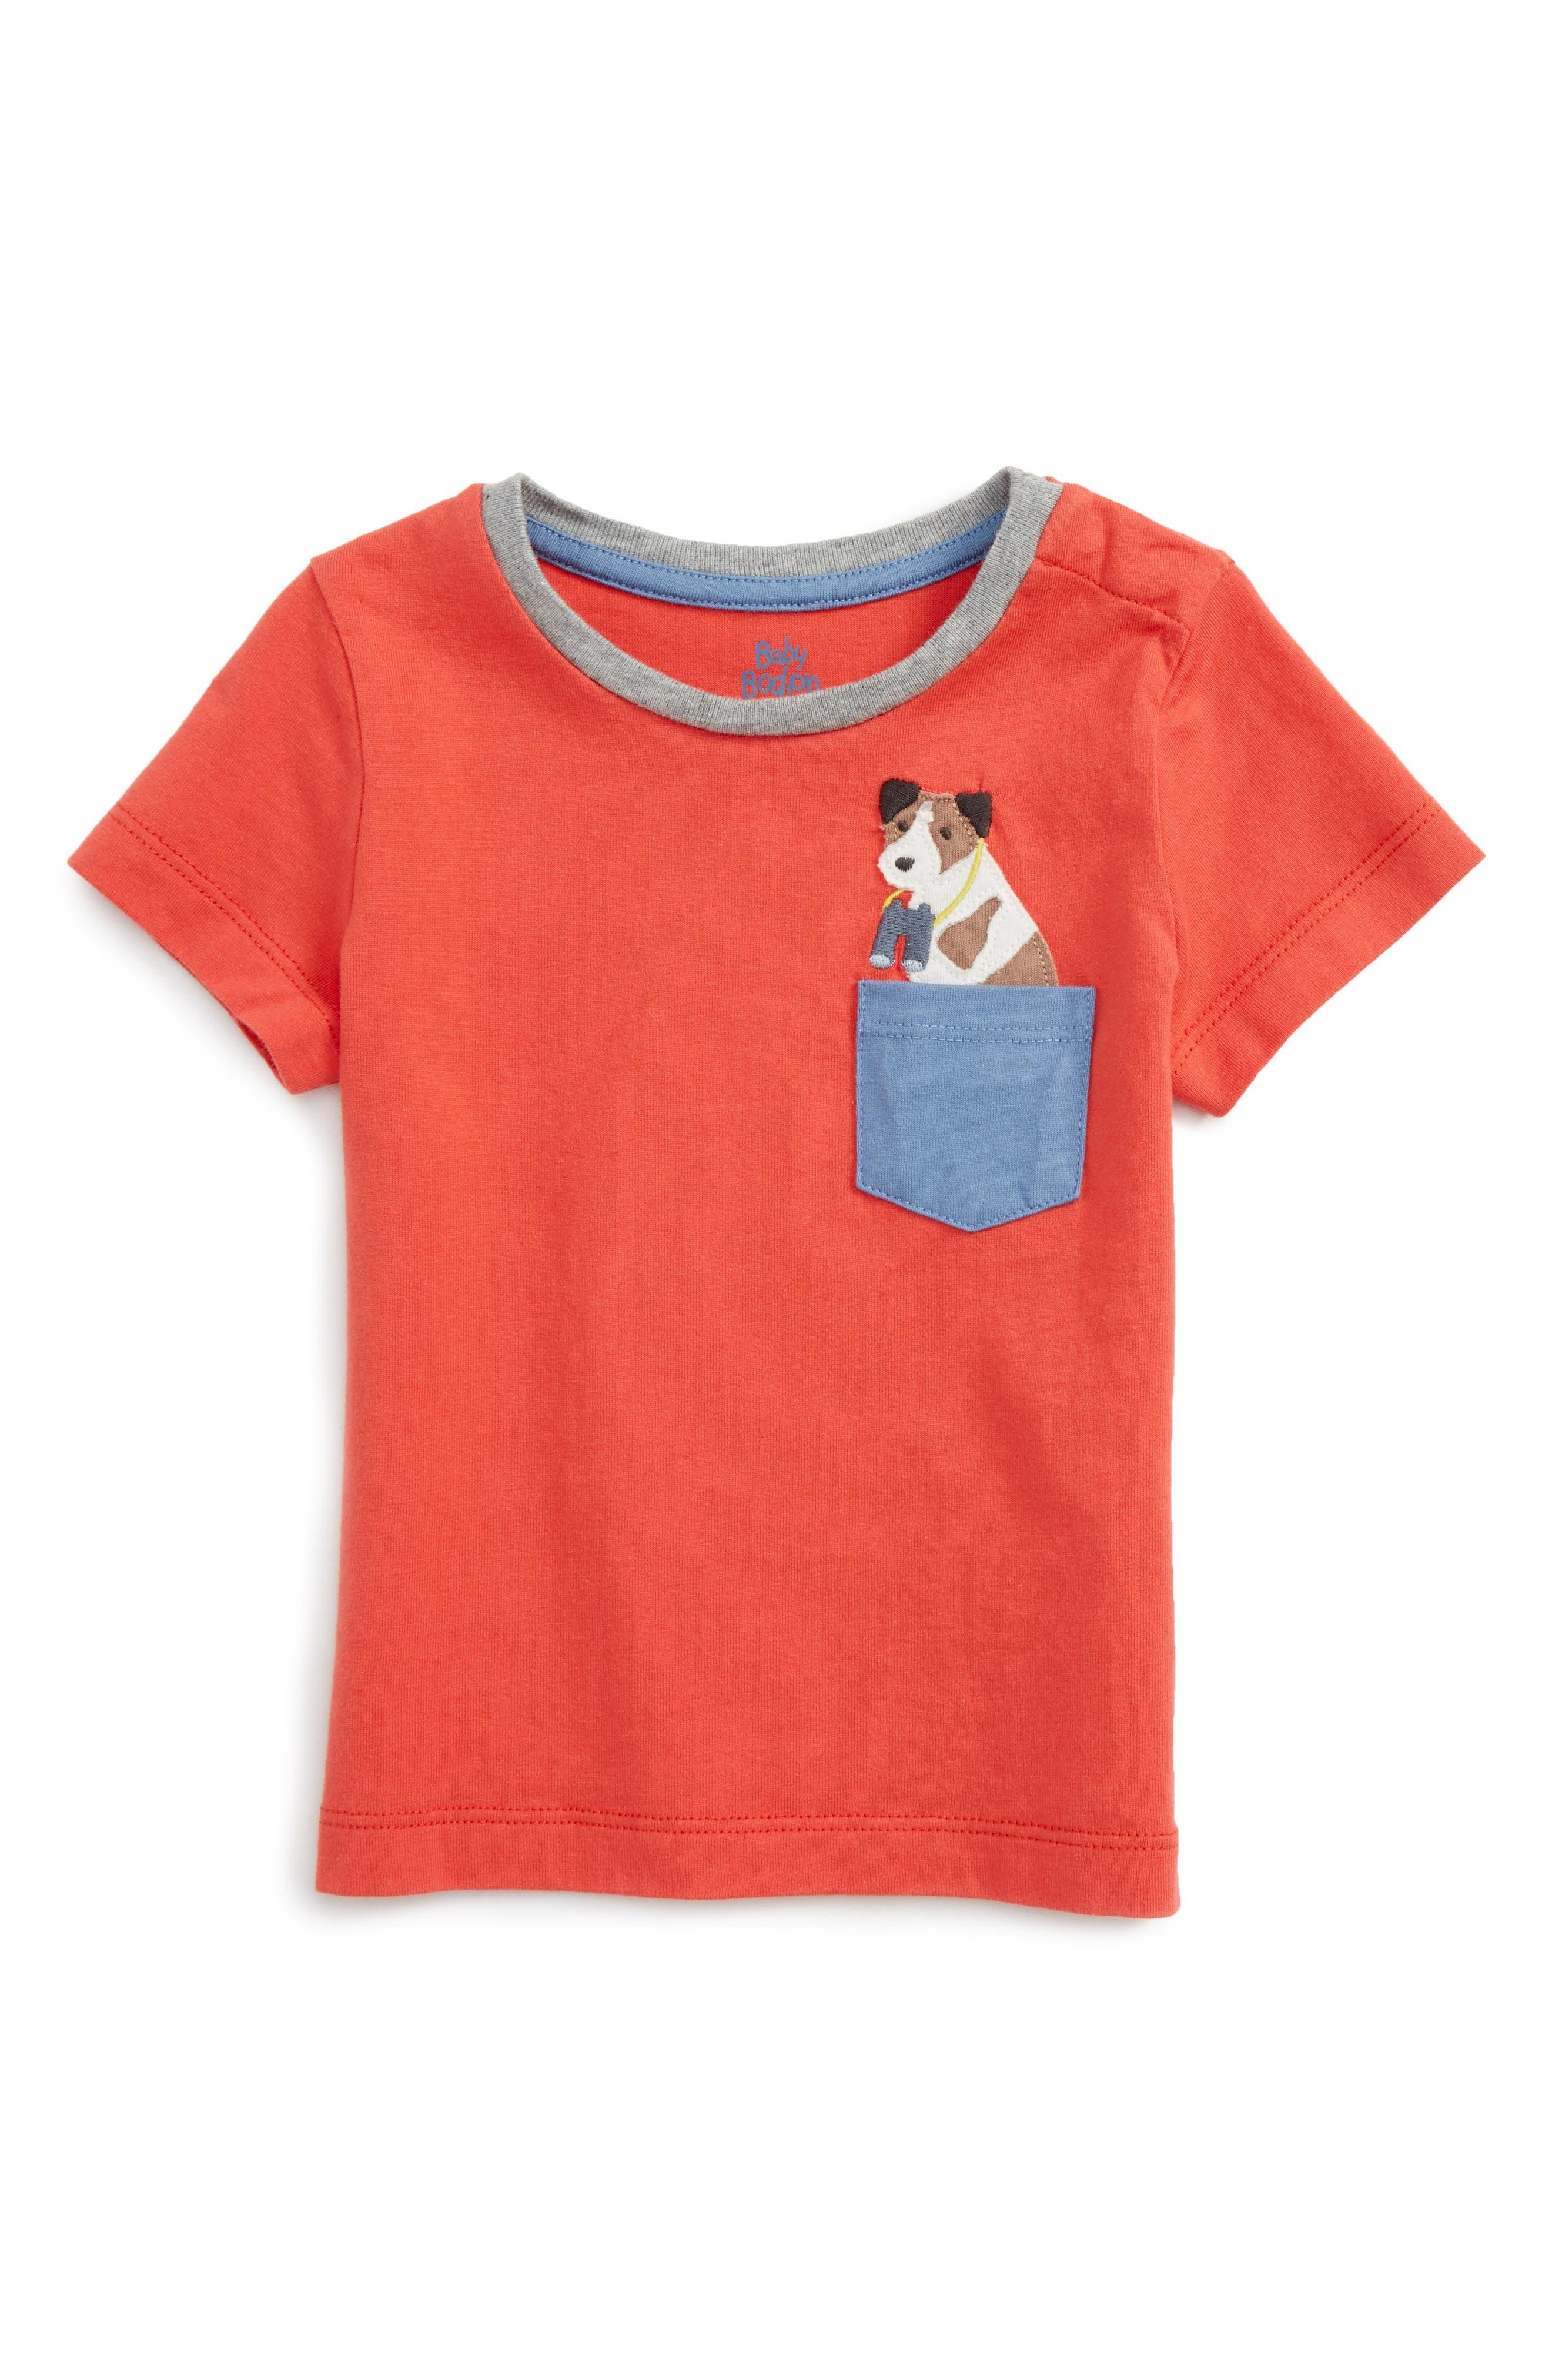 Mini Boden Fun Pocket T-Shirt (Baby & Toddler)